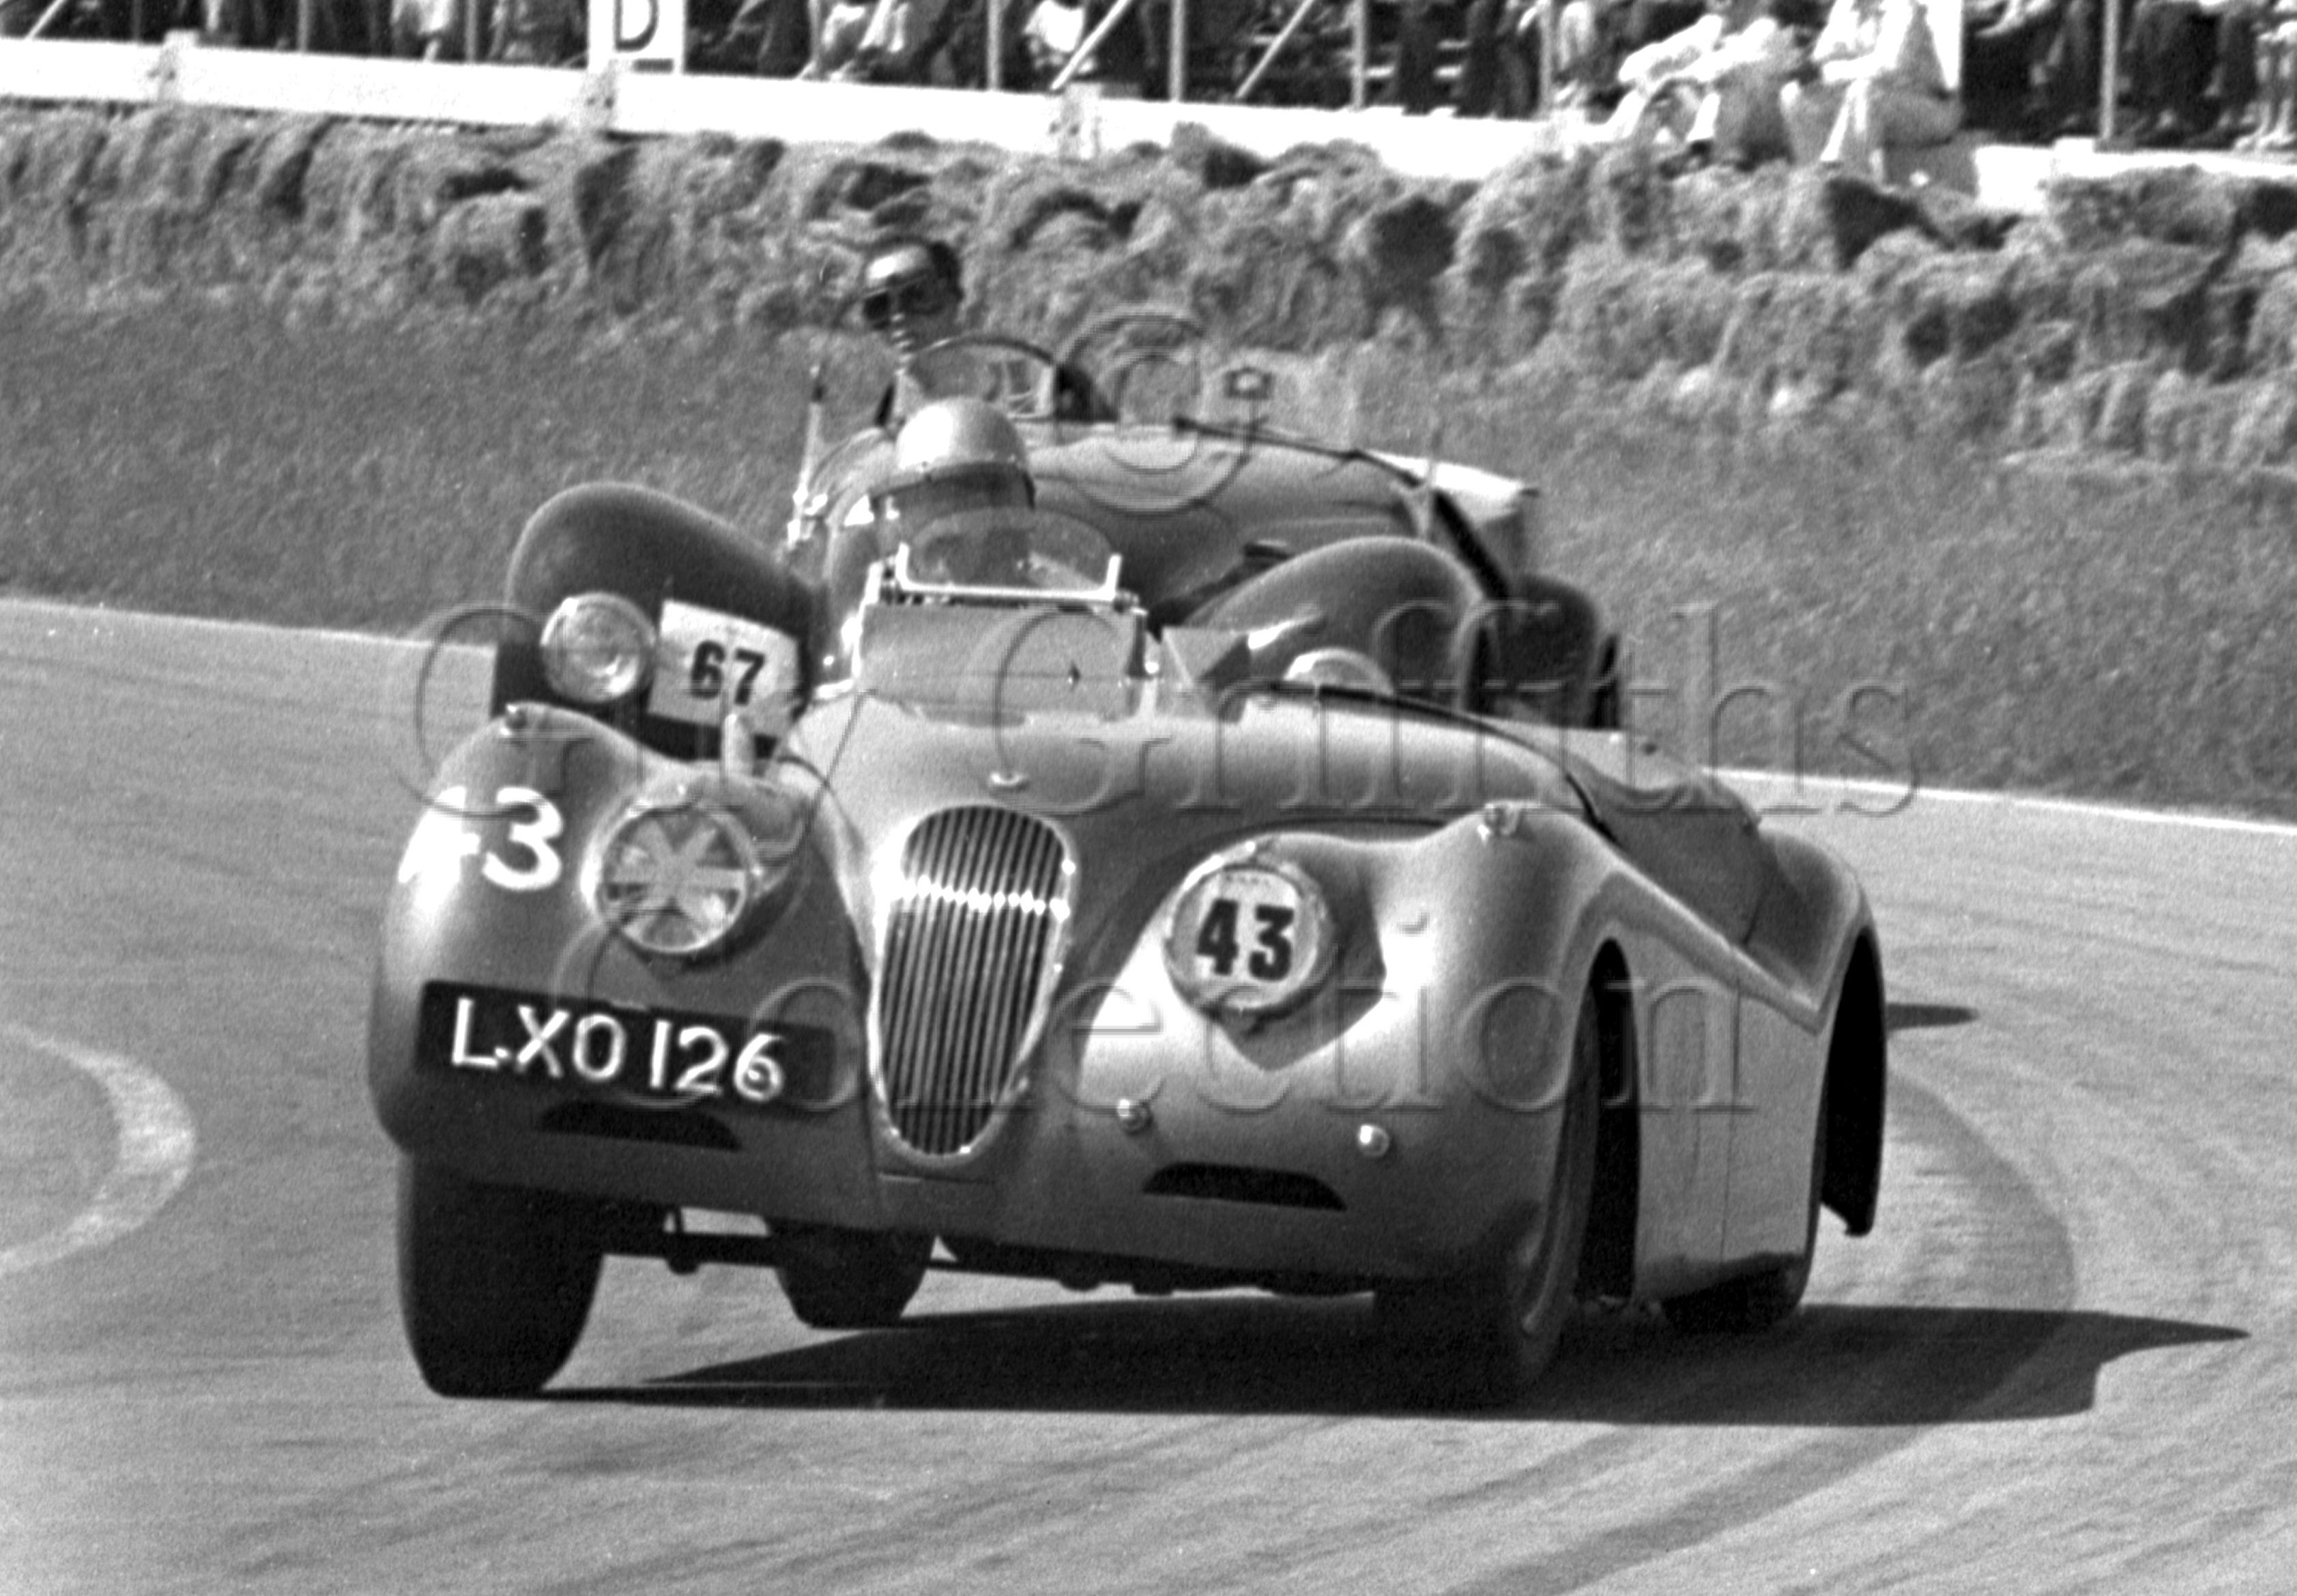 46-174–D-Pierpoint–Jaguar–LXO-126–Goodwood–16-06-1951.jpg - Guy Griffiths Collection